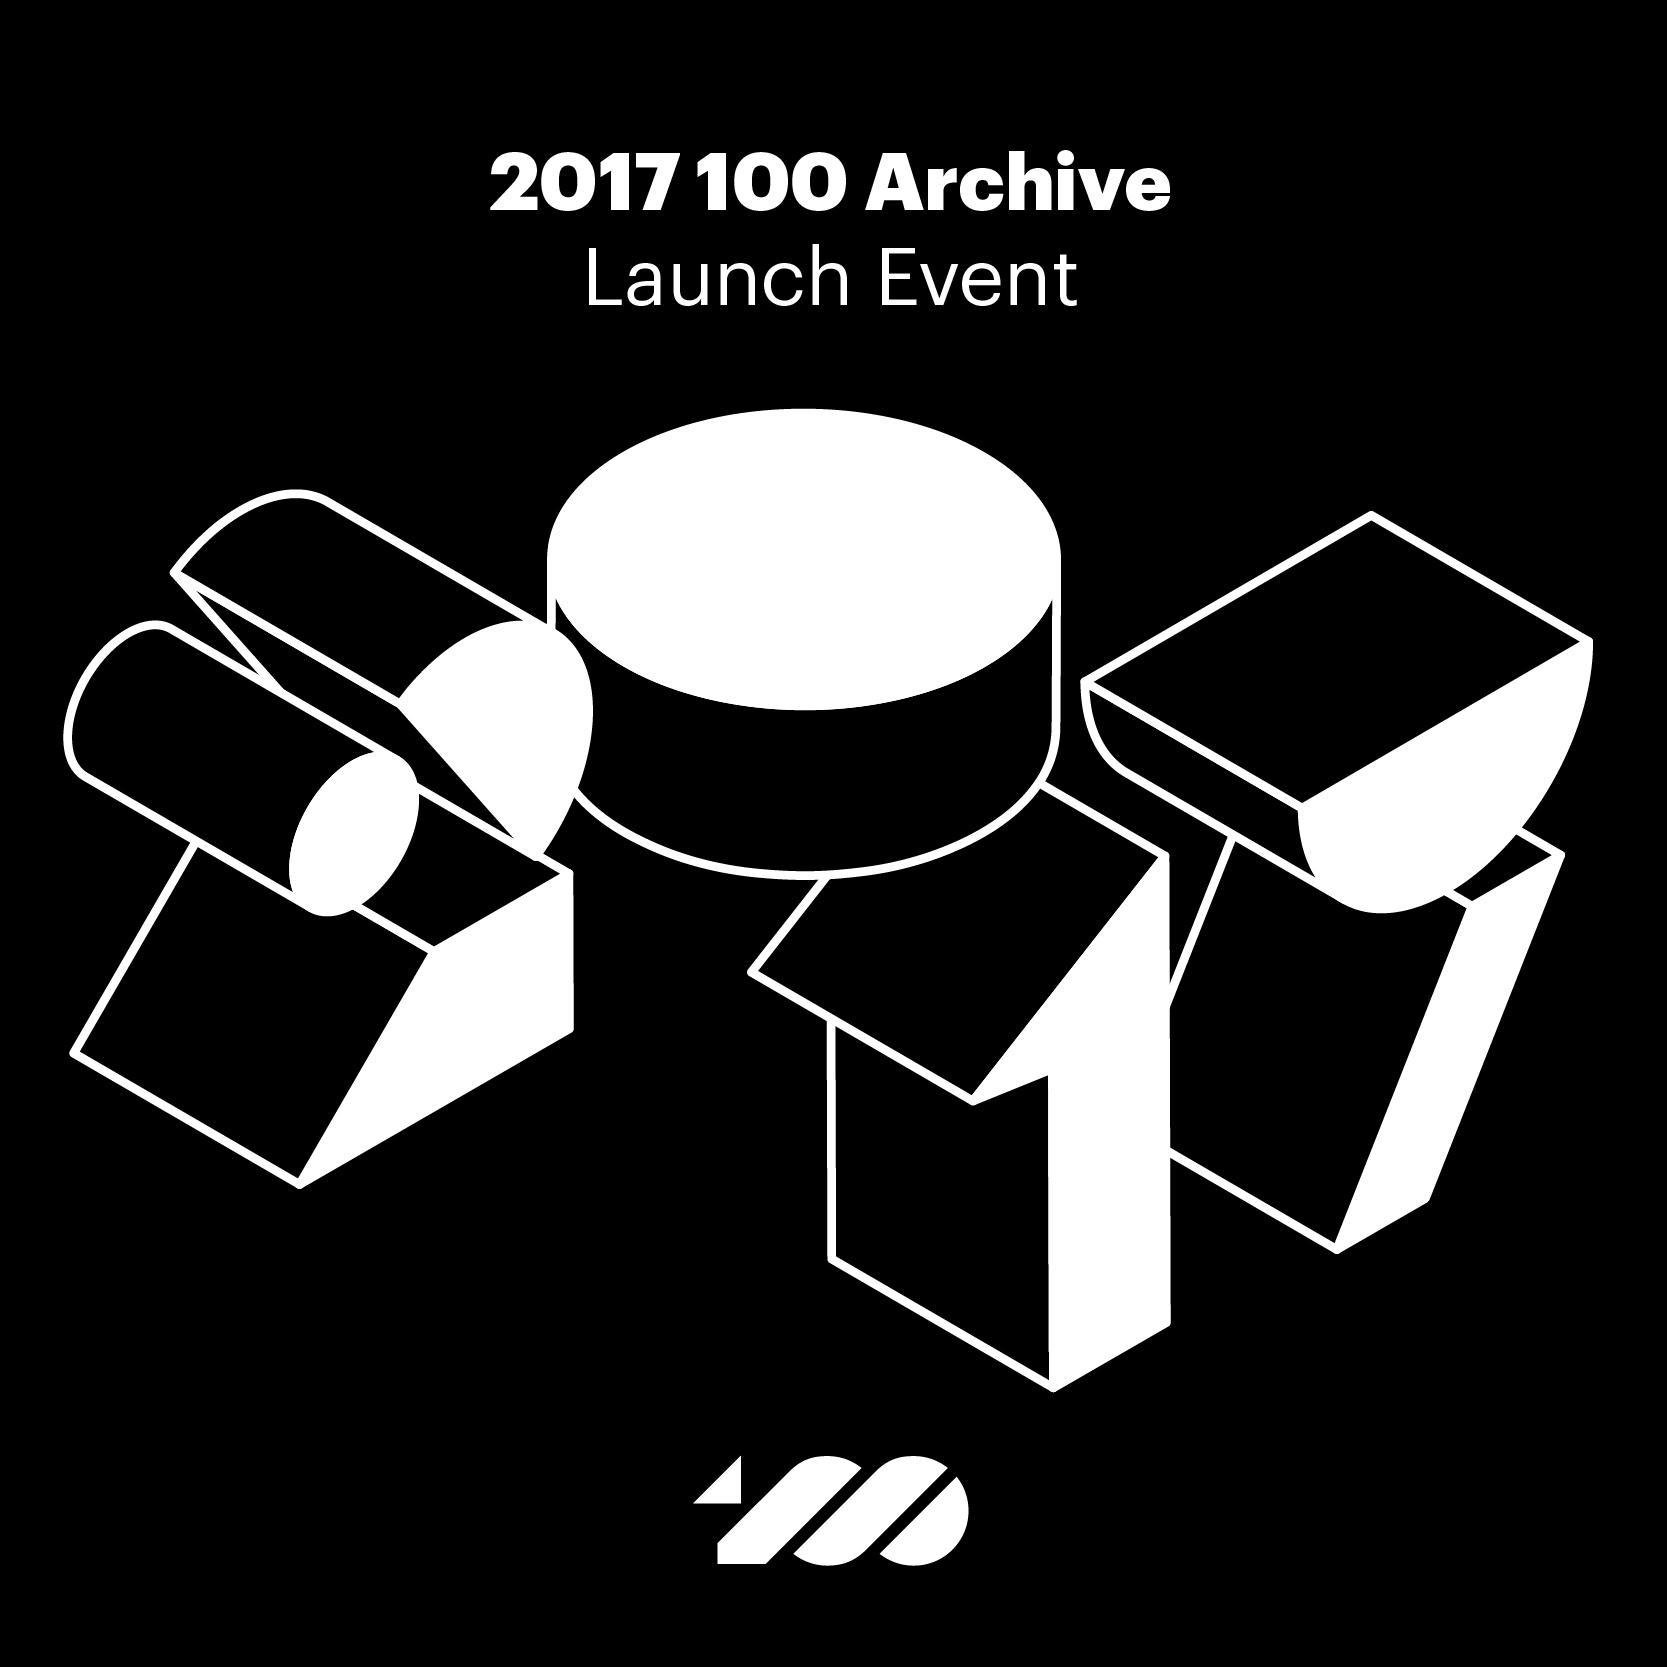 thur_22nd_7pm830pm_br_2017_100_archive_launch